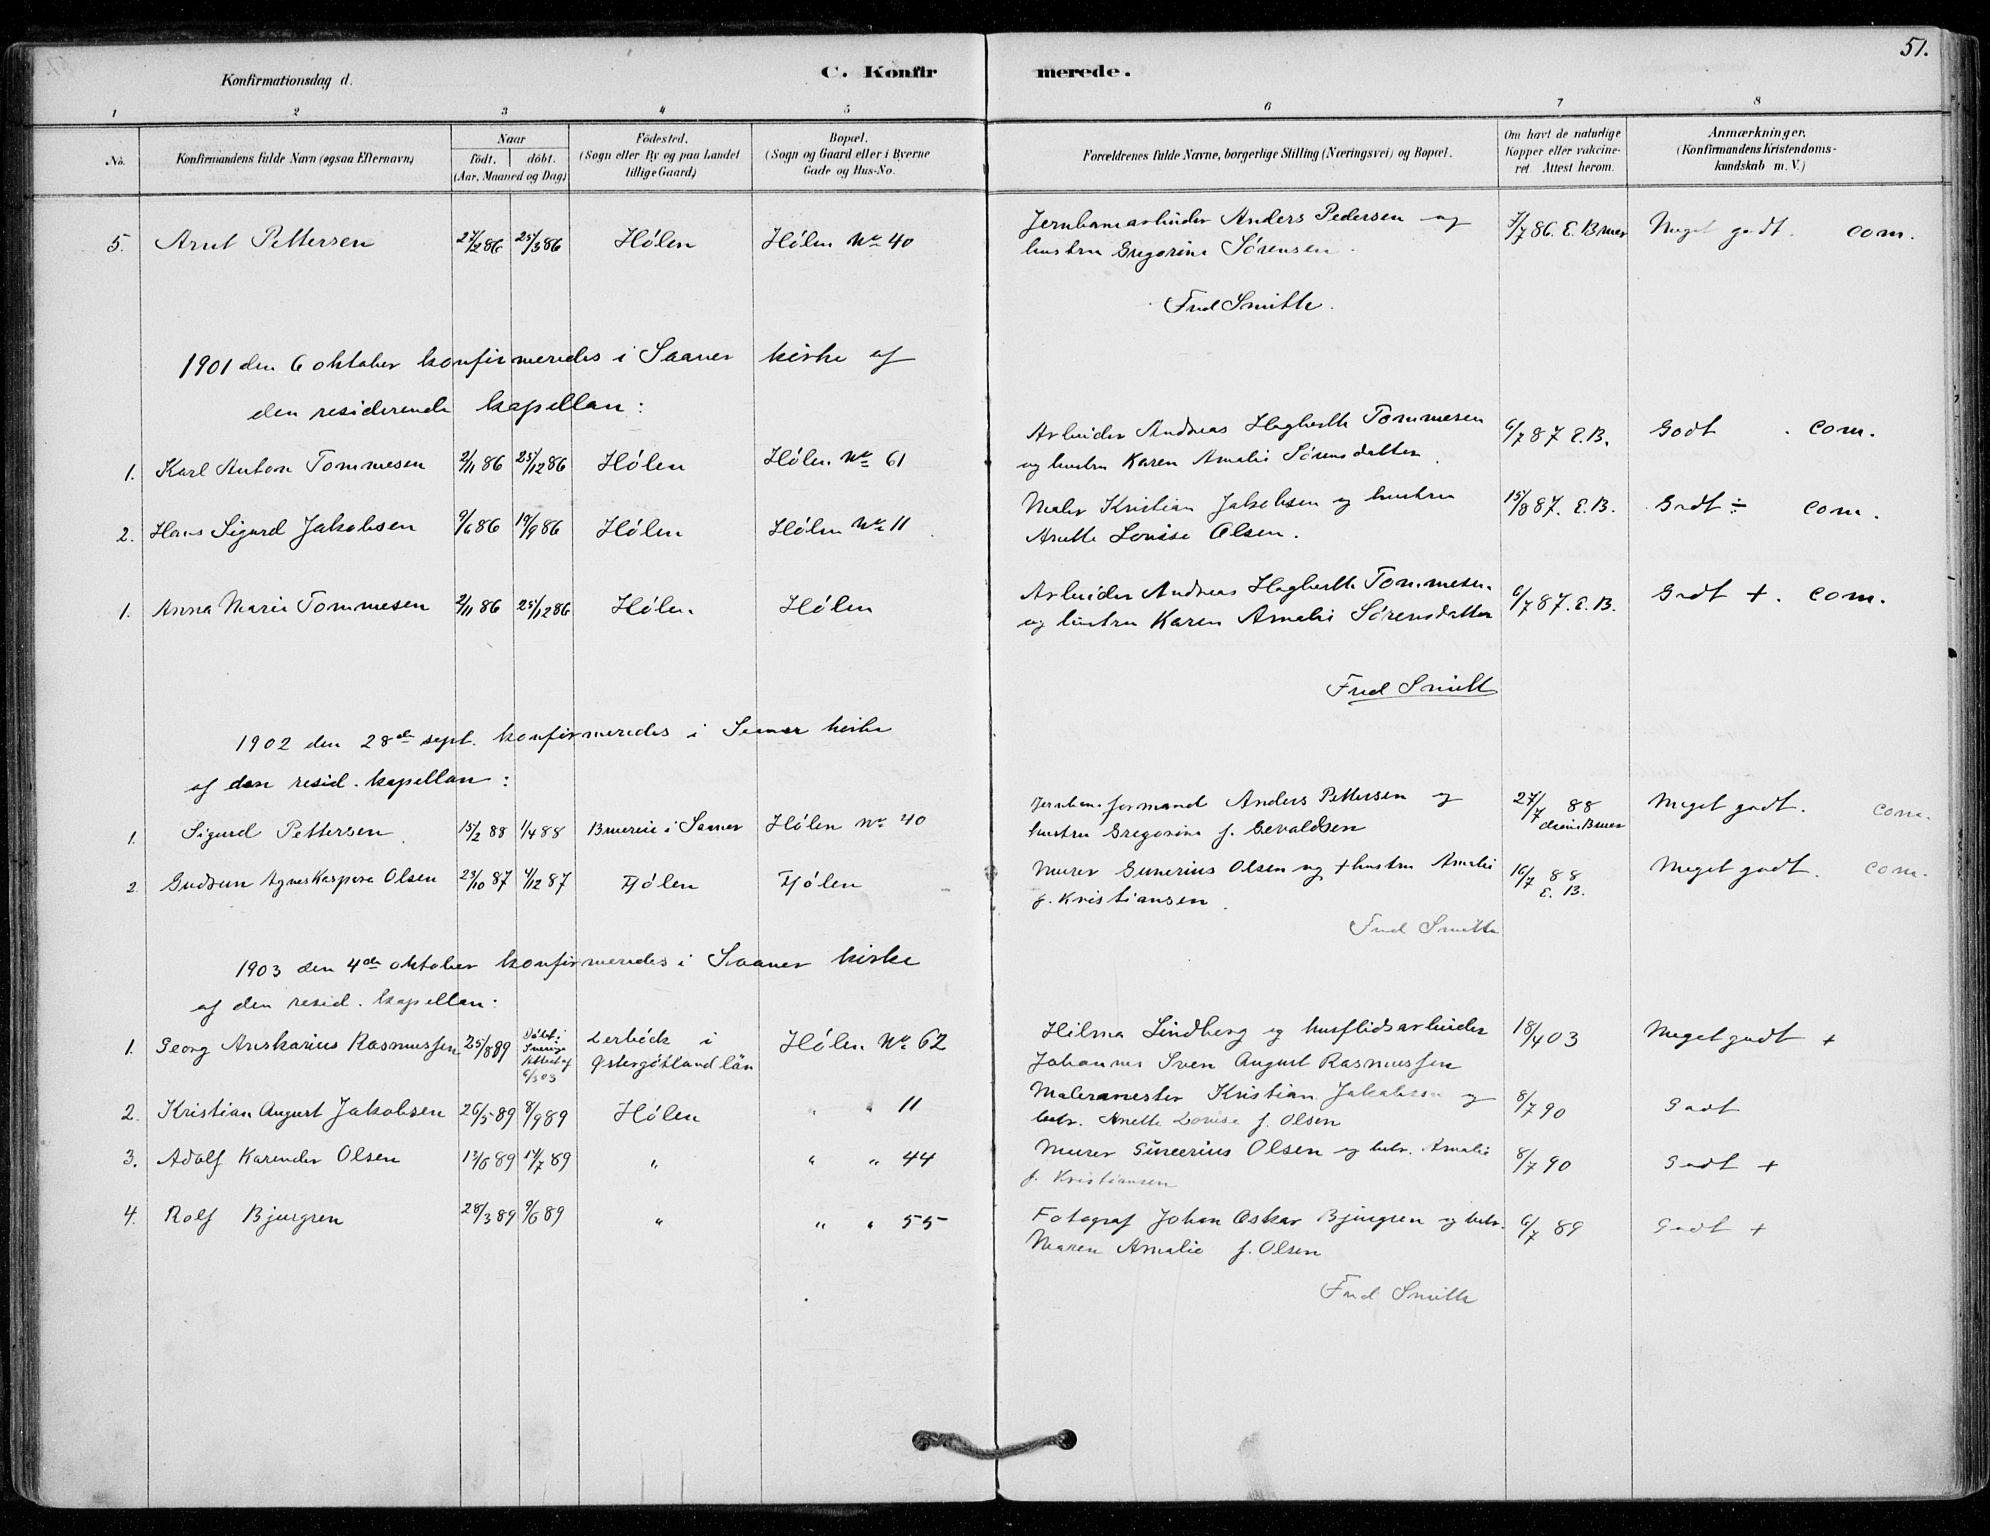 SAO, Vestby prestekontor Kirkebøker, F/Fe/L0001: Ministerialbok nr. V 1, 1878-1931, s. 51